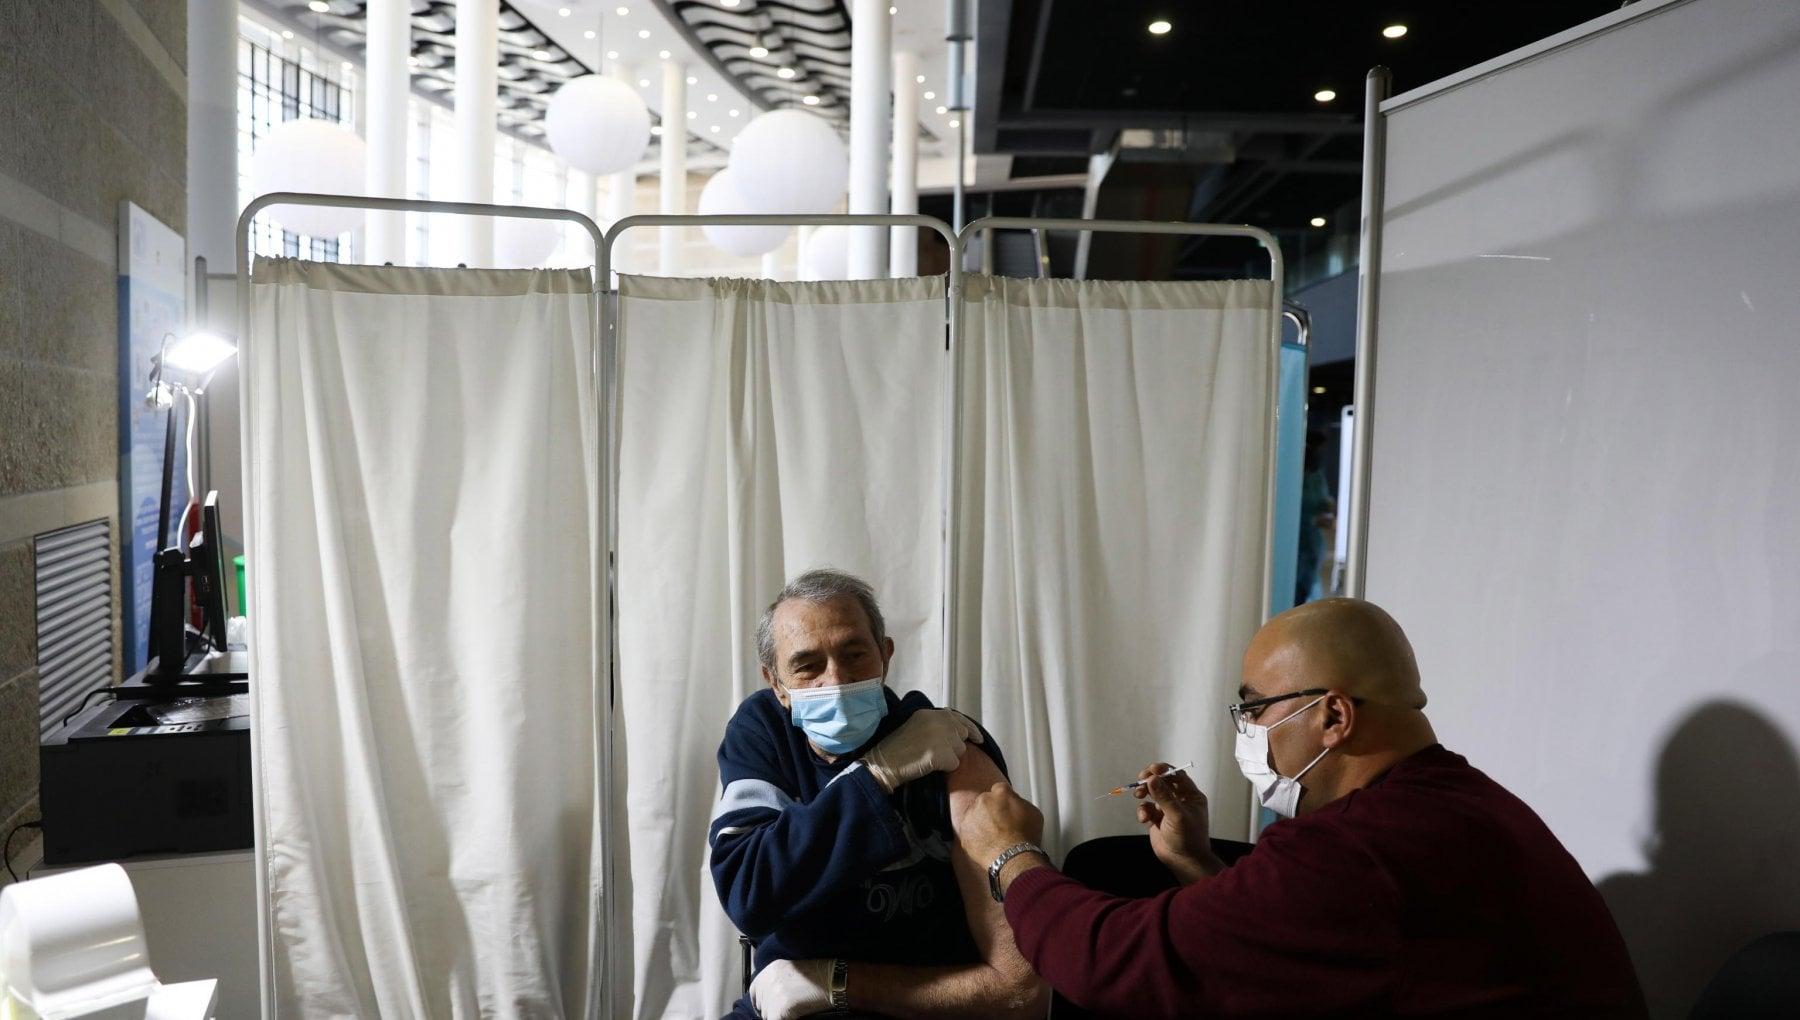 Covid cosi la campagna per i vaccini unisce i palestinesi e i soldati israeliani